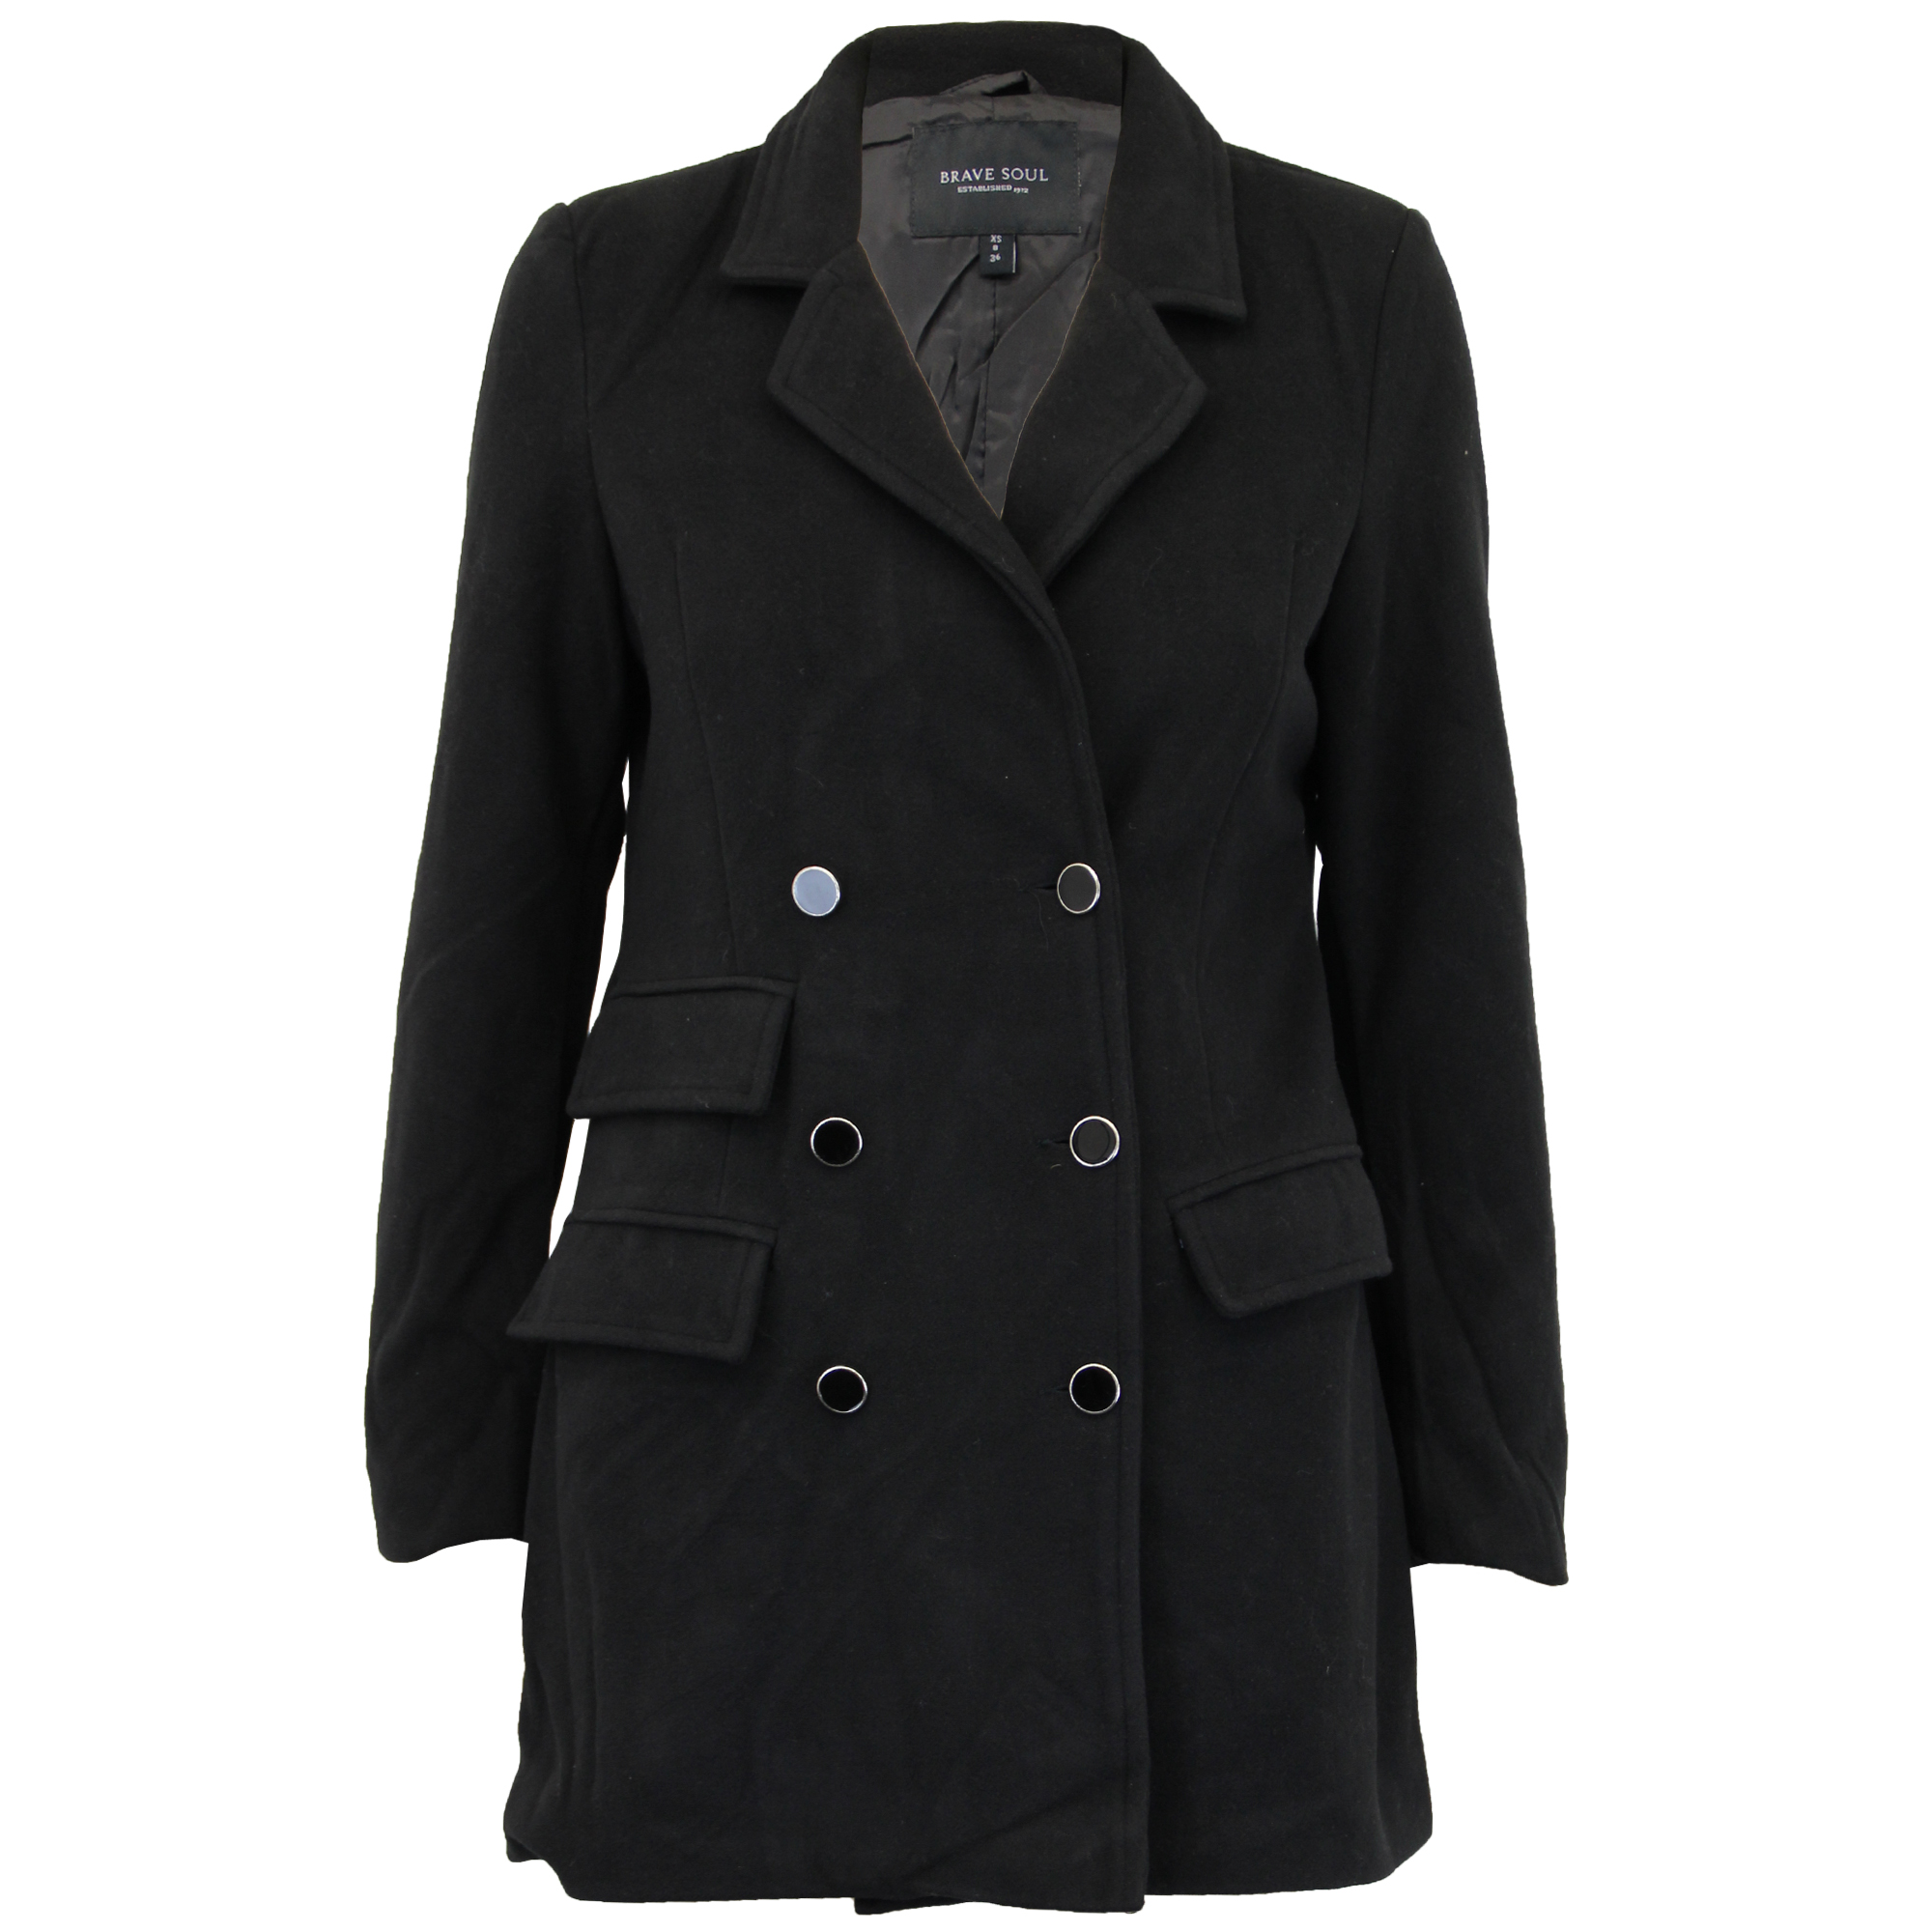 Ladies Jacket Brave Soul Womens Coats Wool Mix Double ...